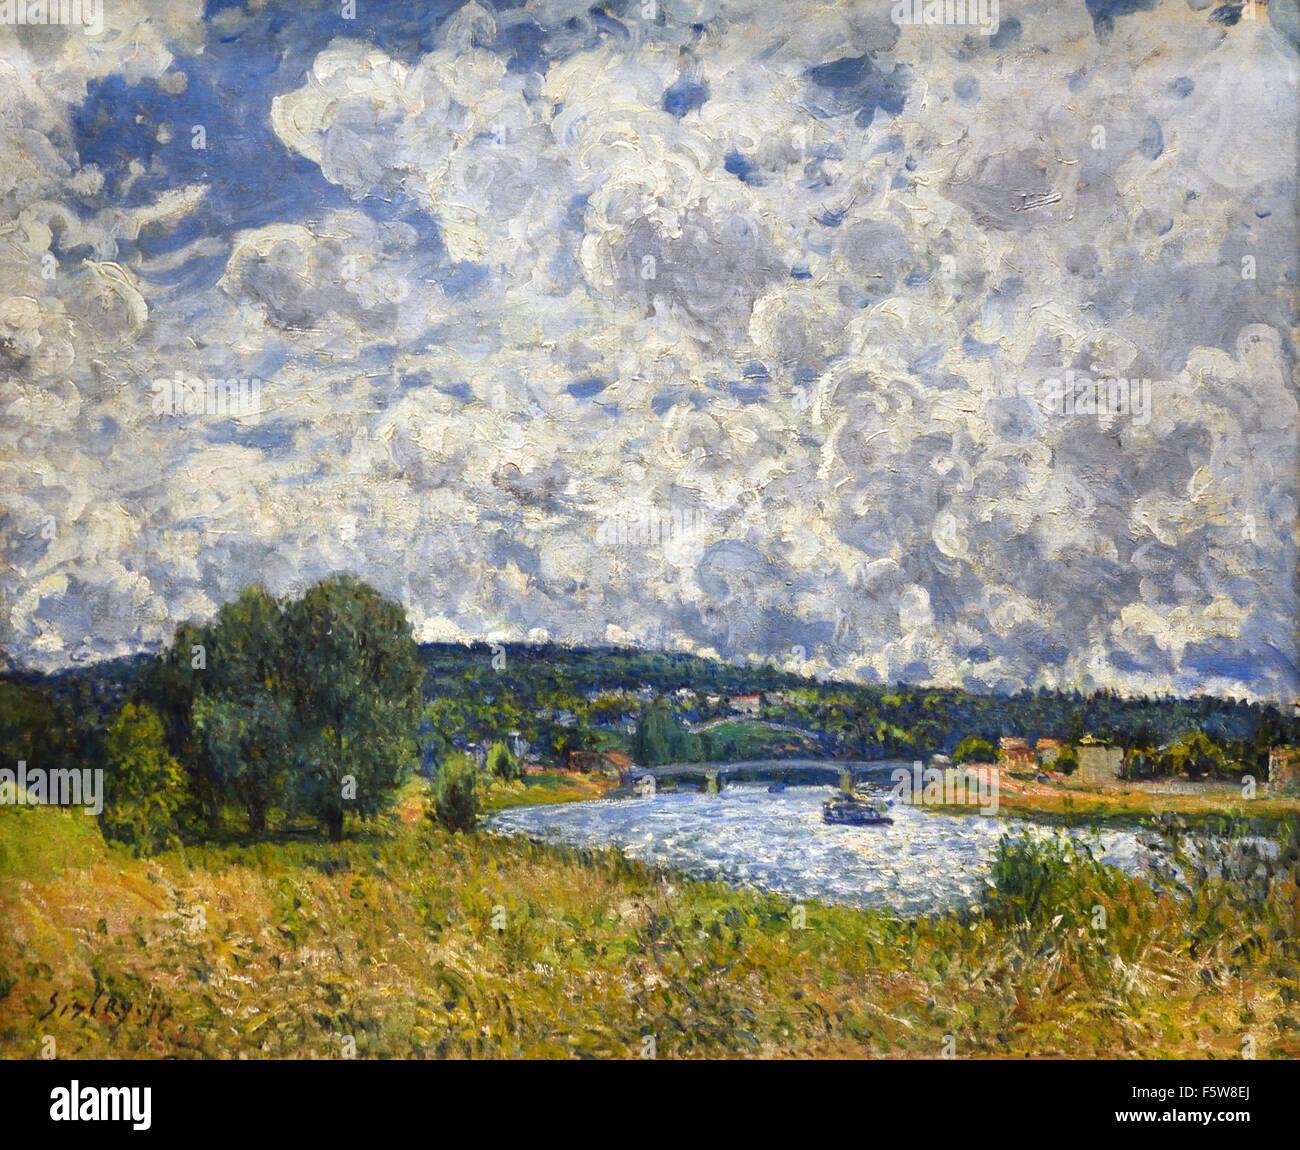 La Seine à Suresnes - The Seine at Suresnes 1877 Alfred Sisley 1839 - 1899 British / French Impressionist France - Stock Image